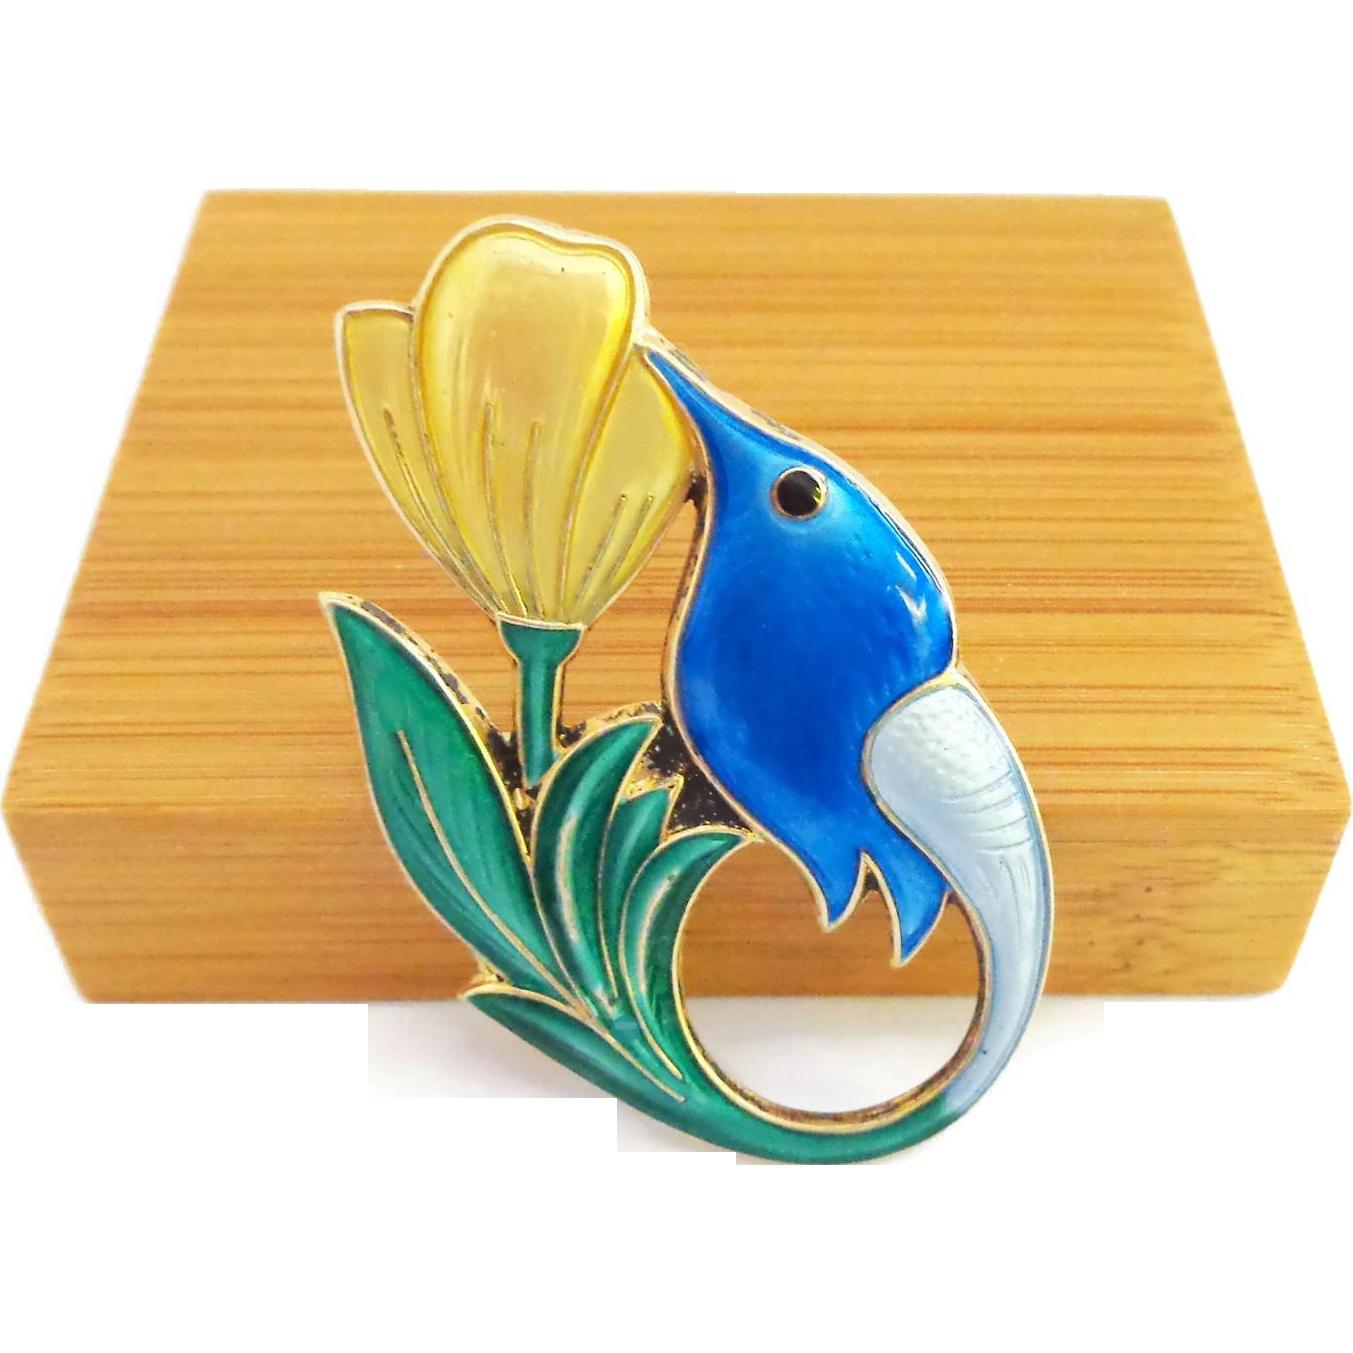 David Andersen Enamel on Sterling HUMMINGBIRD Pin in Blue